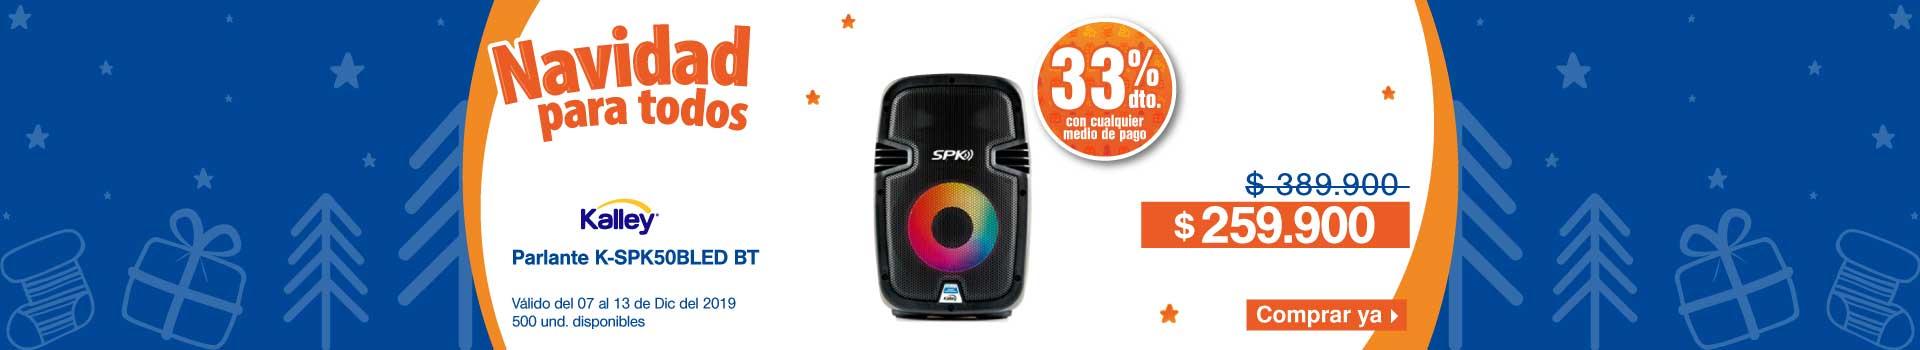 AK-AUDIO-KALLEY-SPK50BLED-HIPER3-07DIC